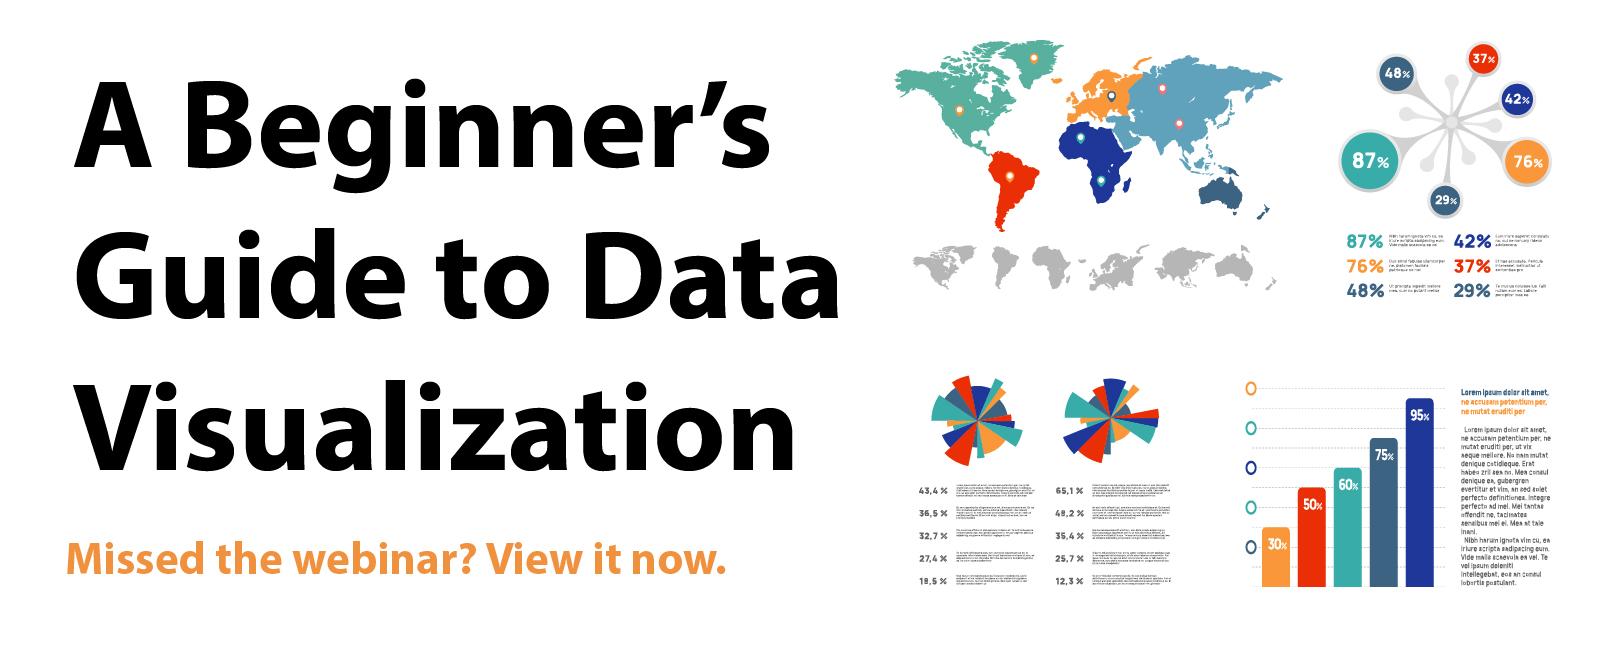 Beginners Guide to data visualization graphi 775 x 310-01.jpg